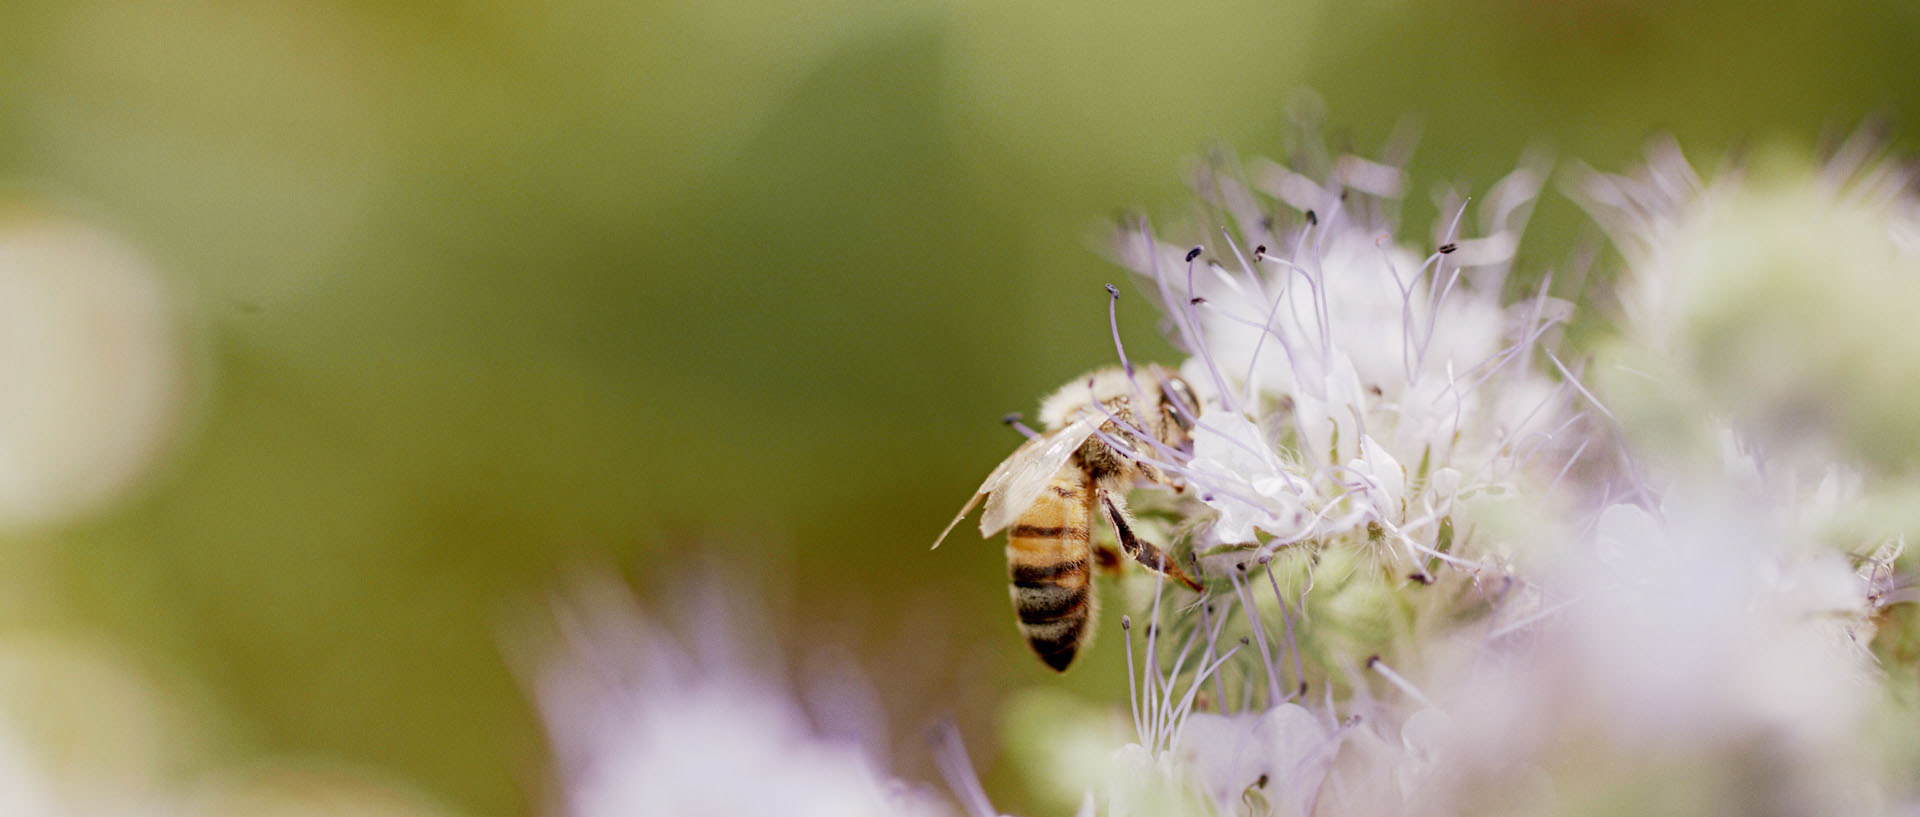 Mövenpick Swiss Honey Almond